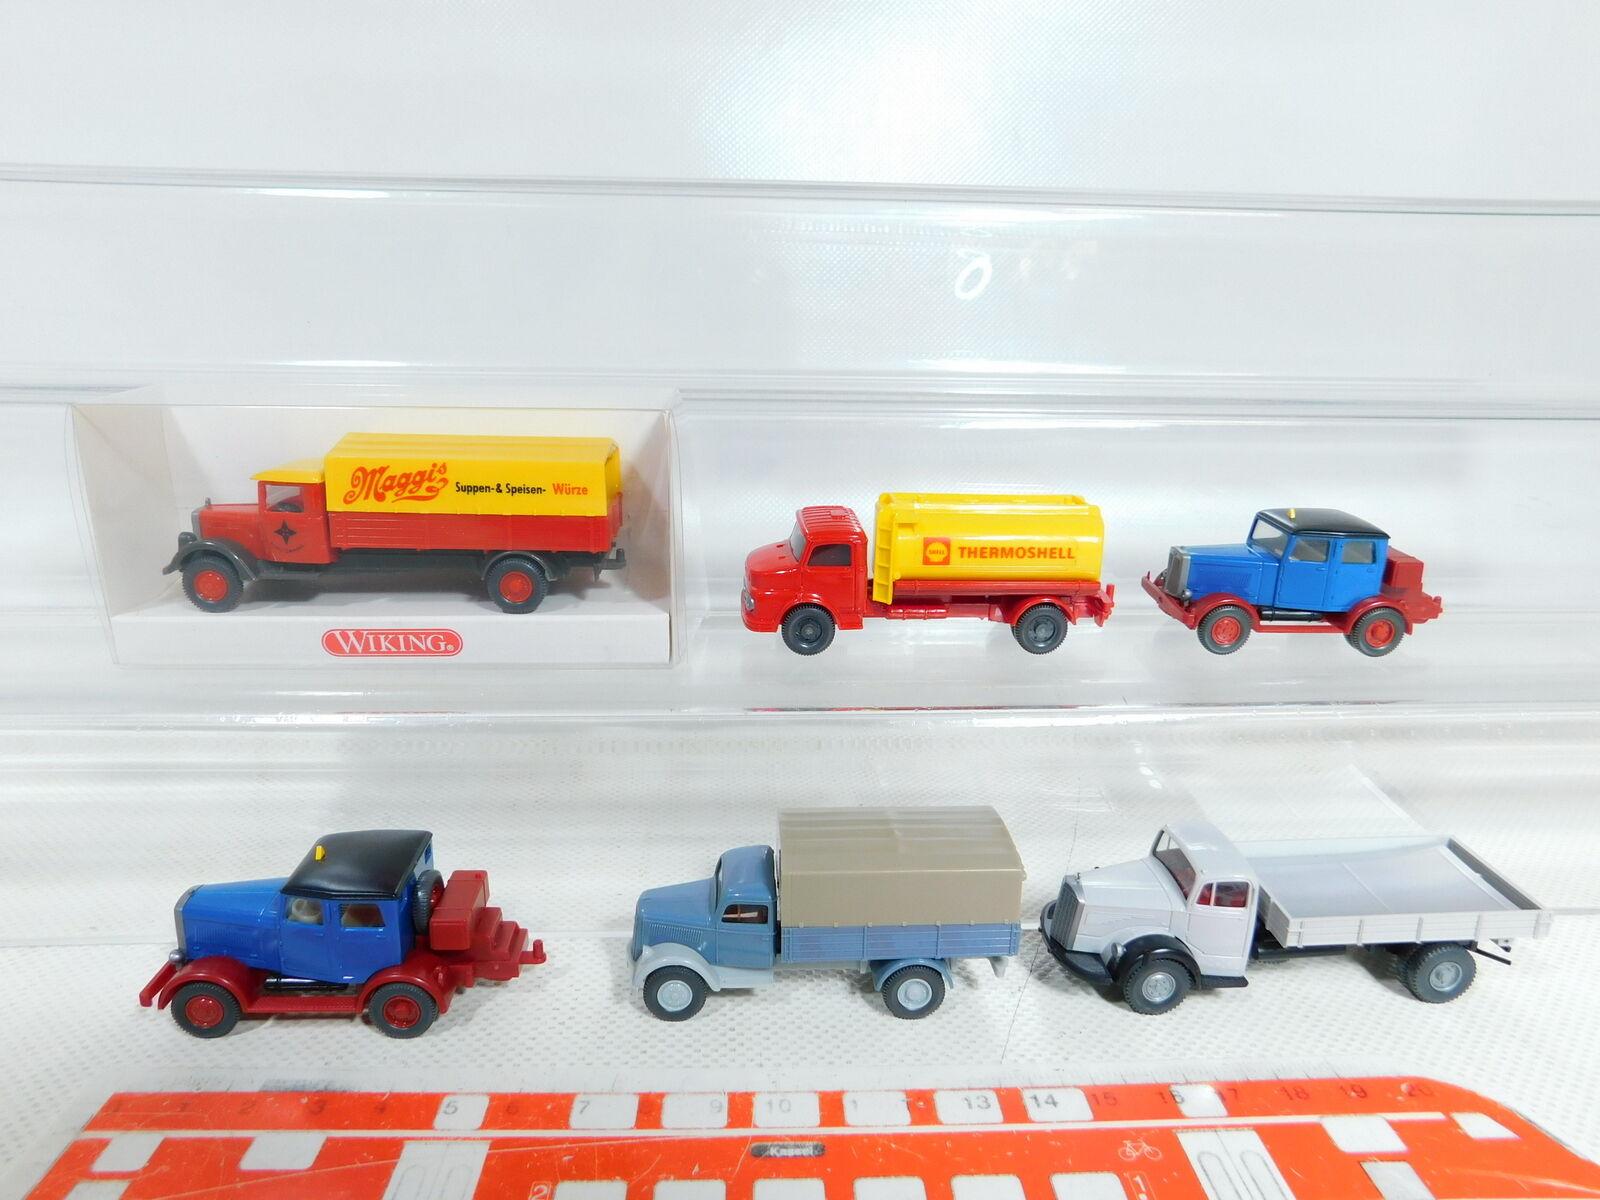 BX391-0,5 x Wiking 1 87   H0 Camión  Hanomag + MB Shell   Maggis + Opel,Nuevo